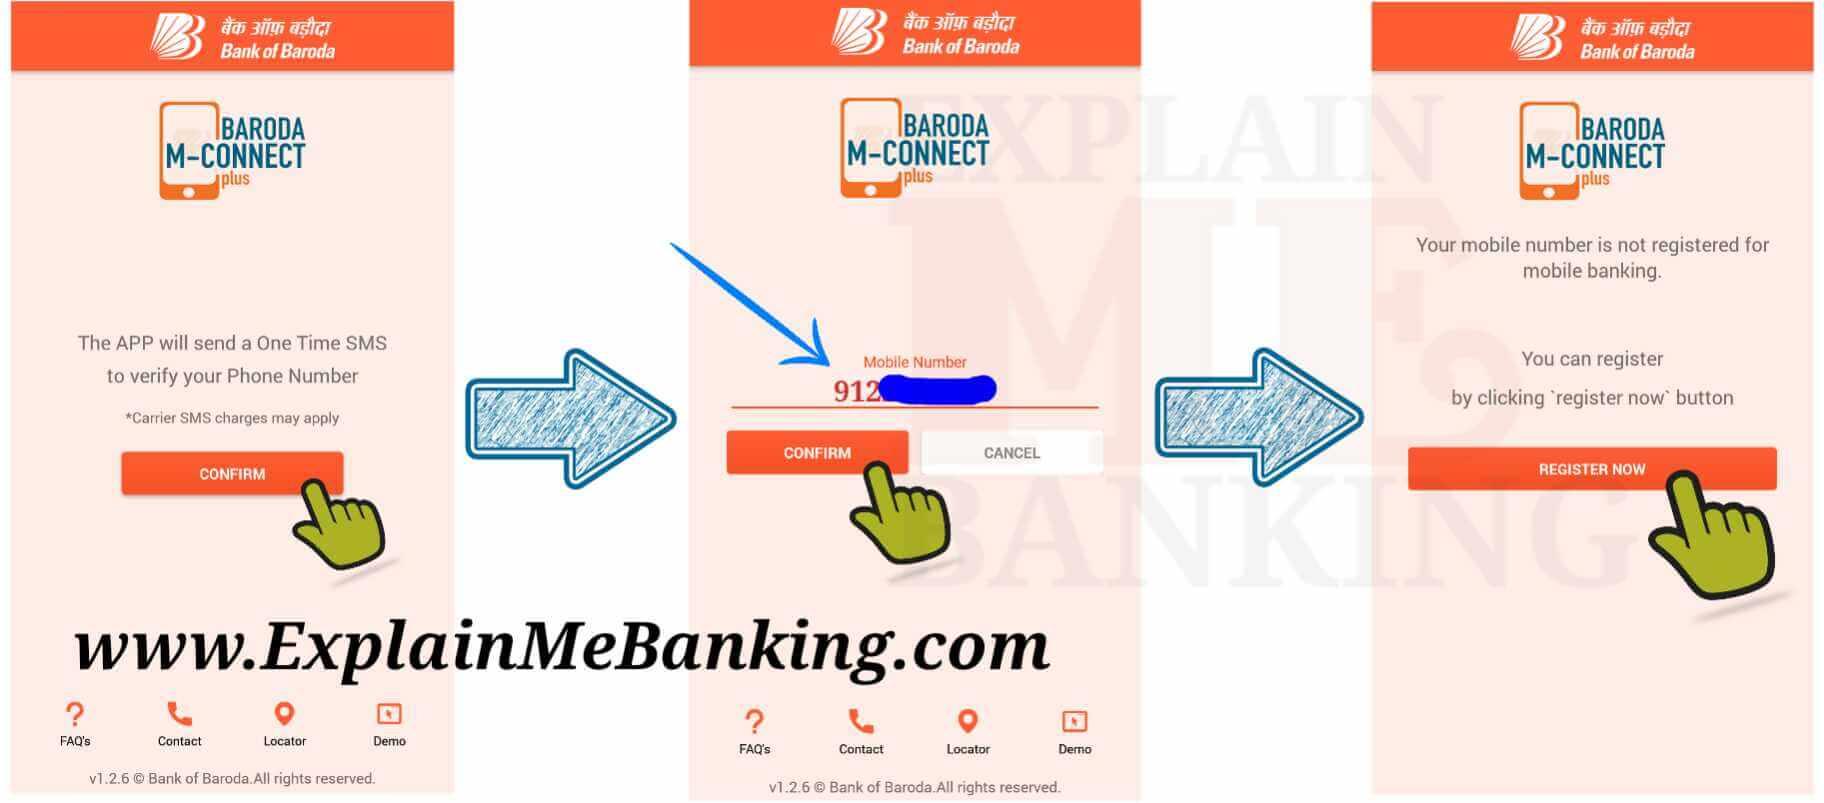 Bank Of Baroda Mobile Banking Registration